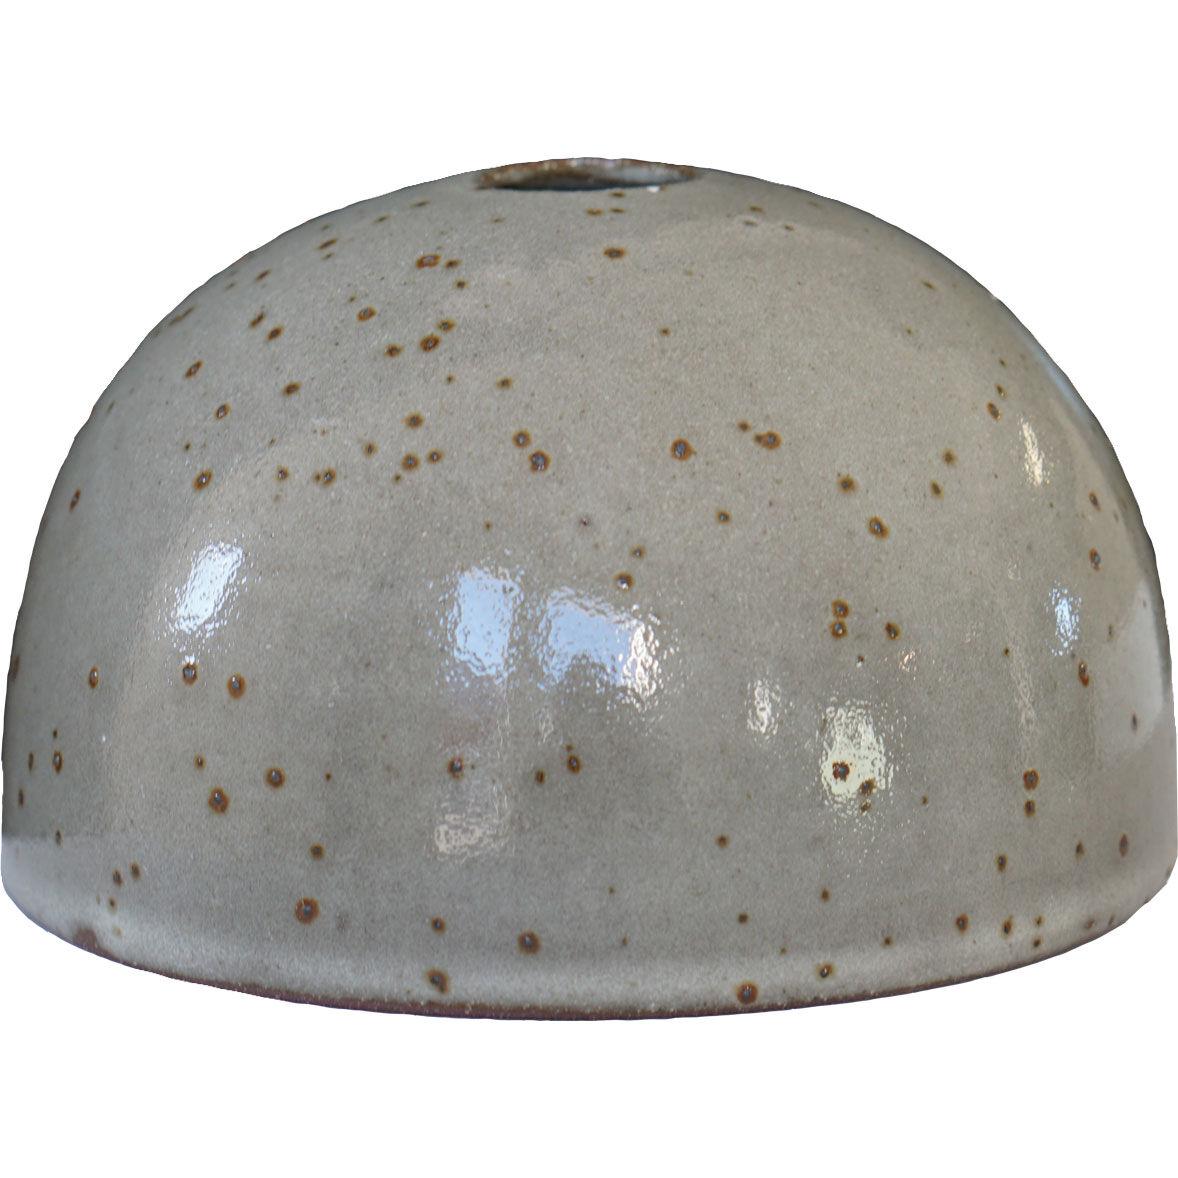 DBKD Bulb Vase Small, Stone